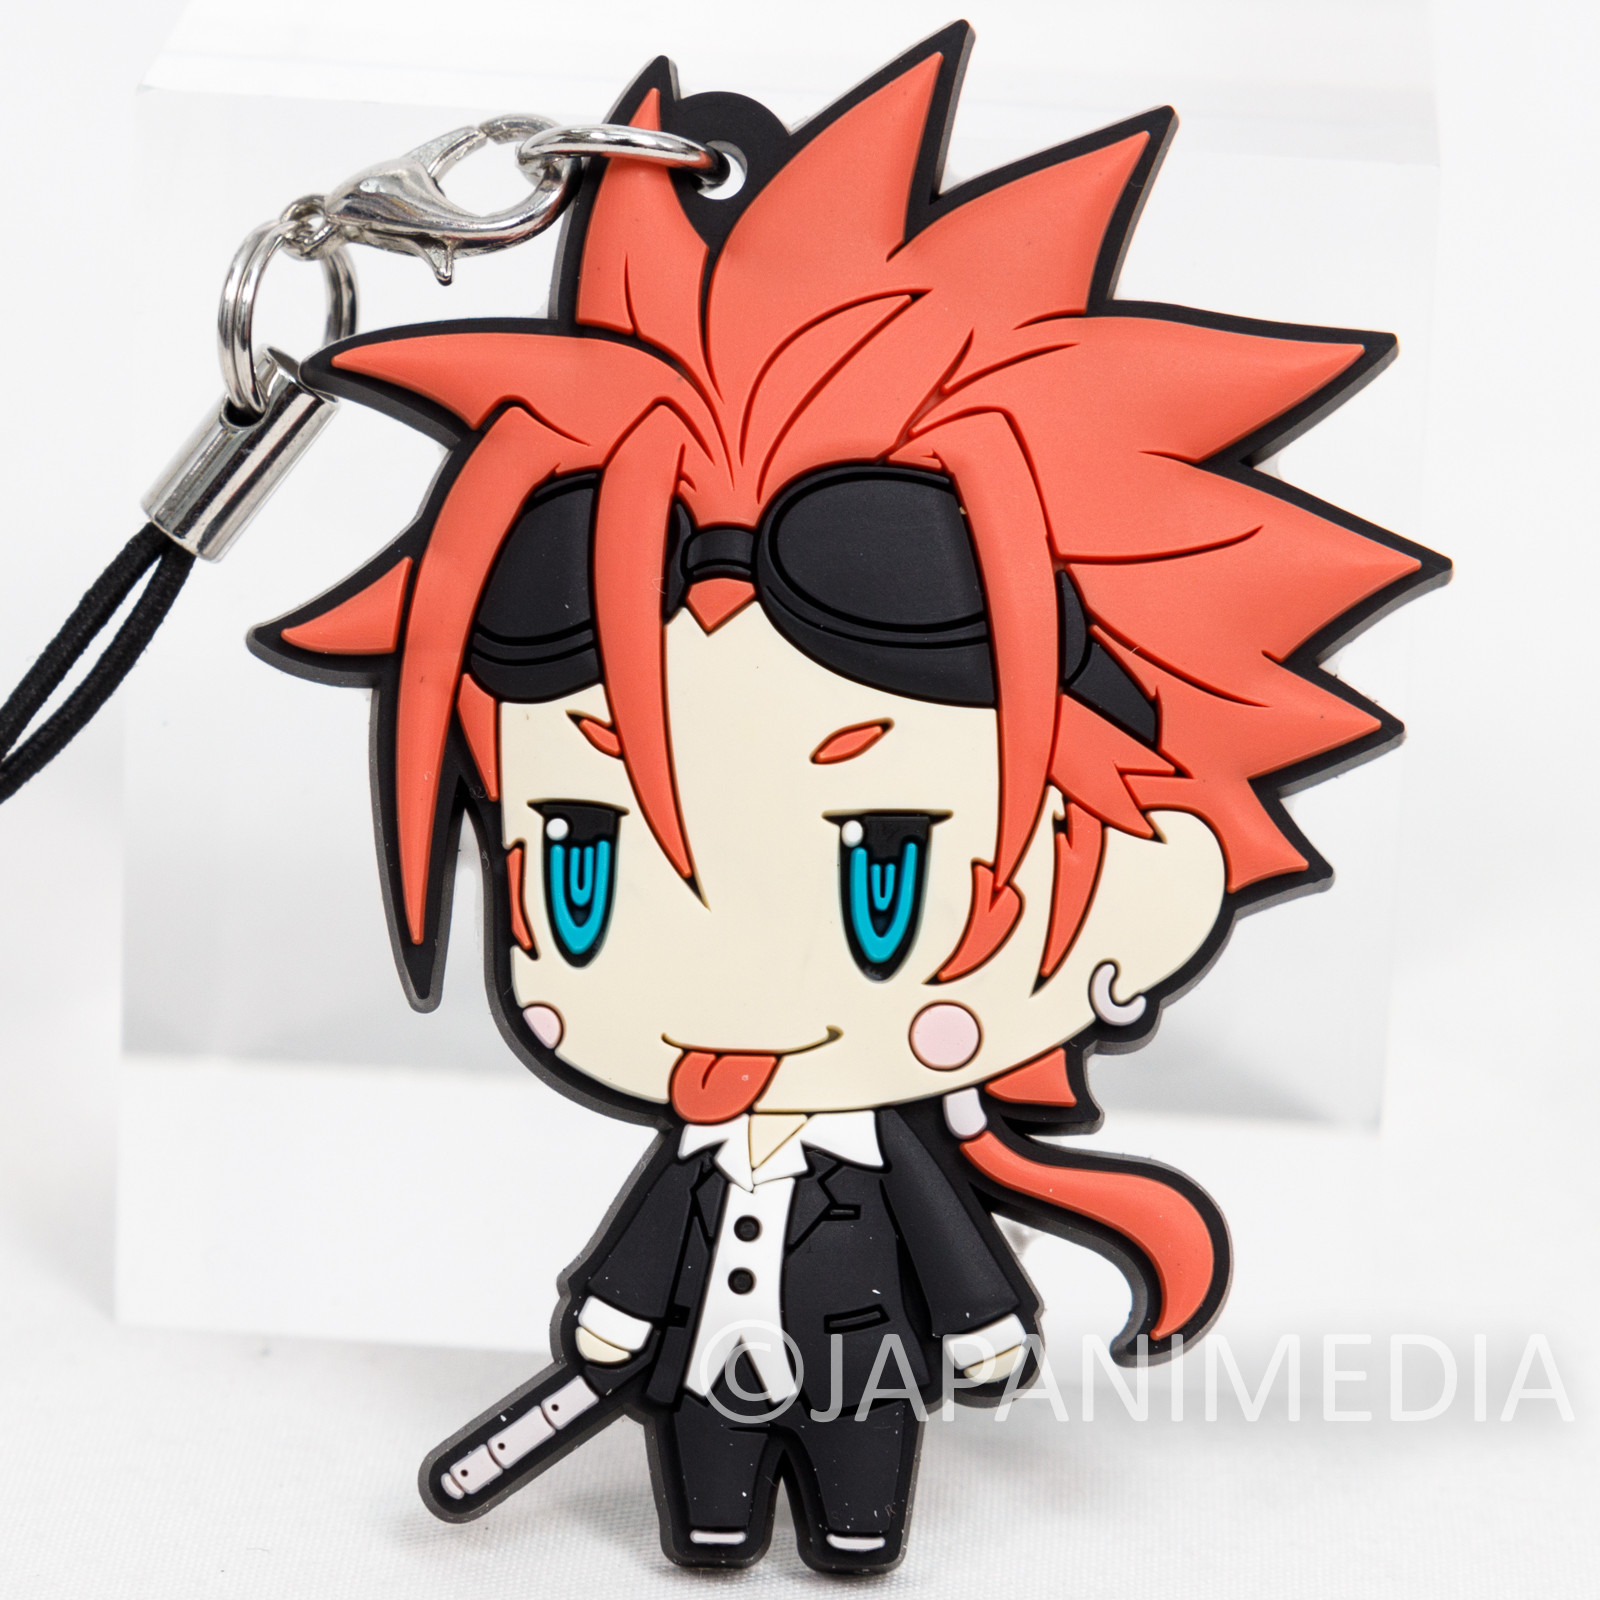 Final Fantasy Reno Mascot Rubber Strap JAPAN SQUARE ENIX